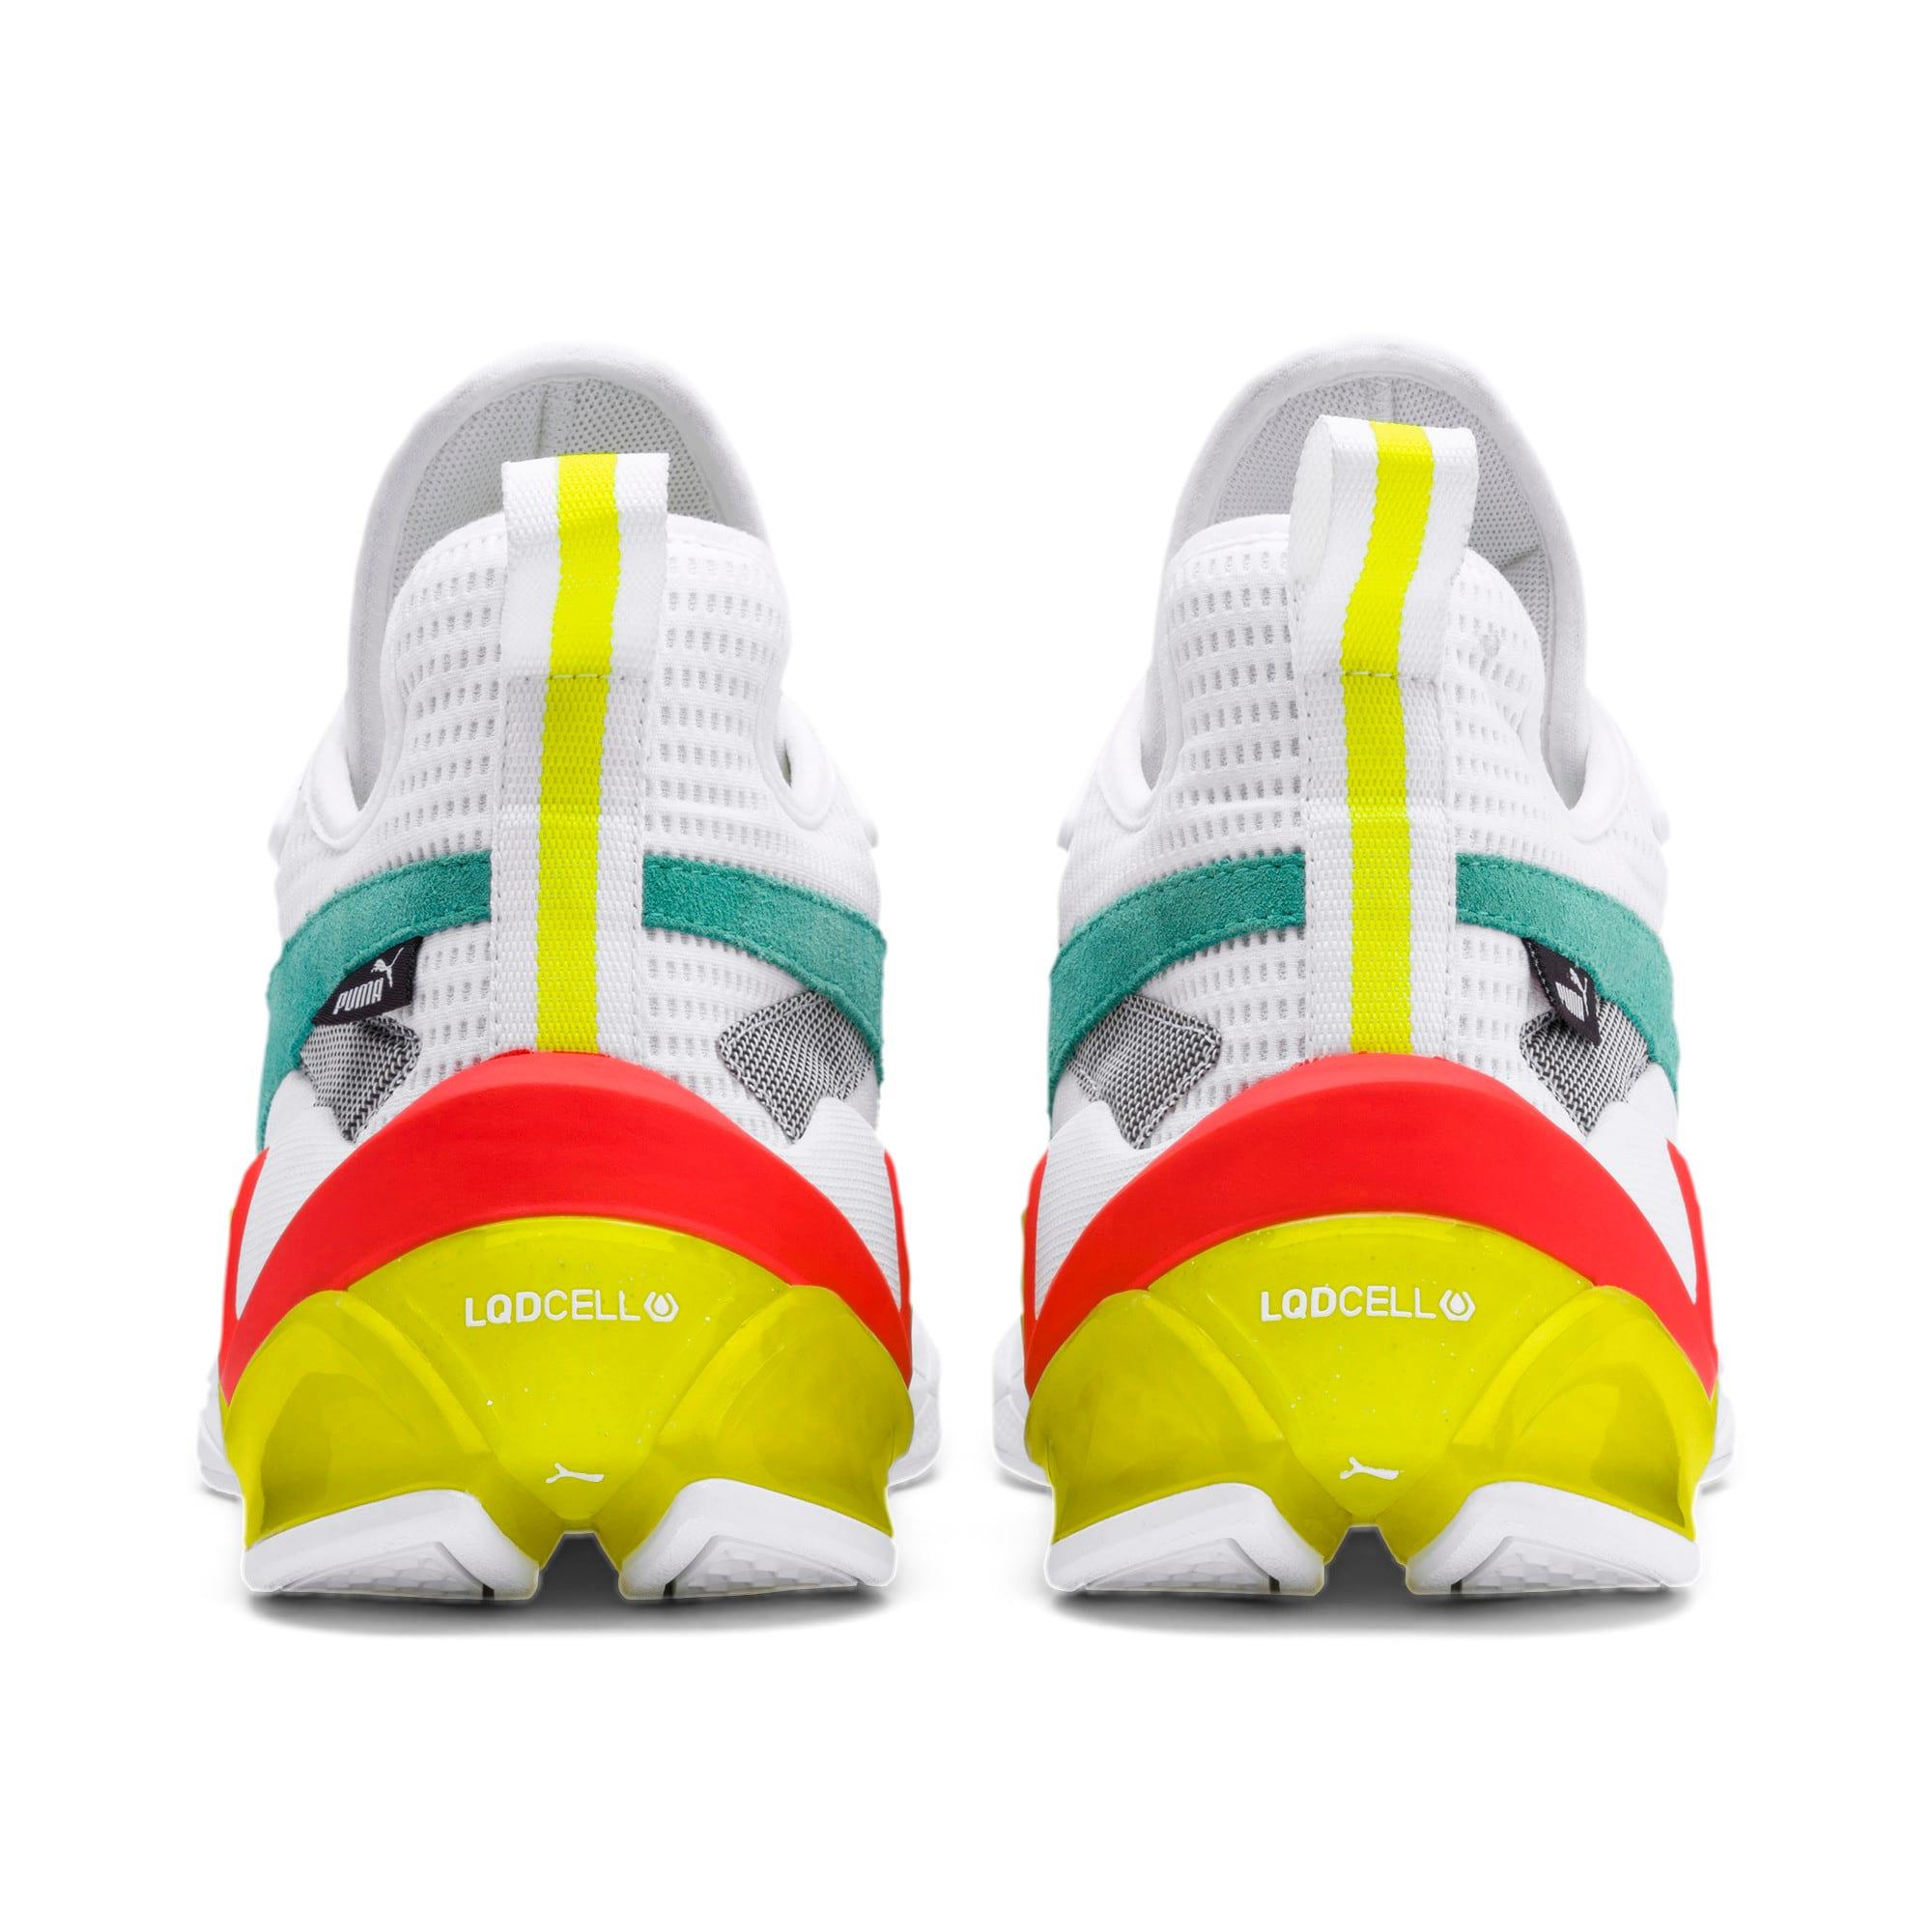 Thumbnail 4 of LQDCELL Origin Men's Training Shoes, Puma White-Yellow Alert, medium